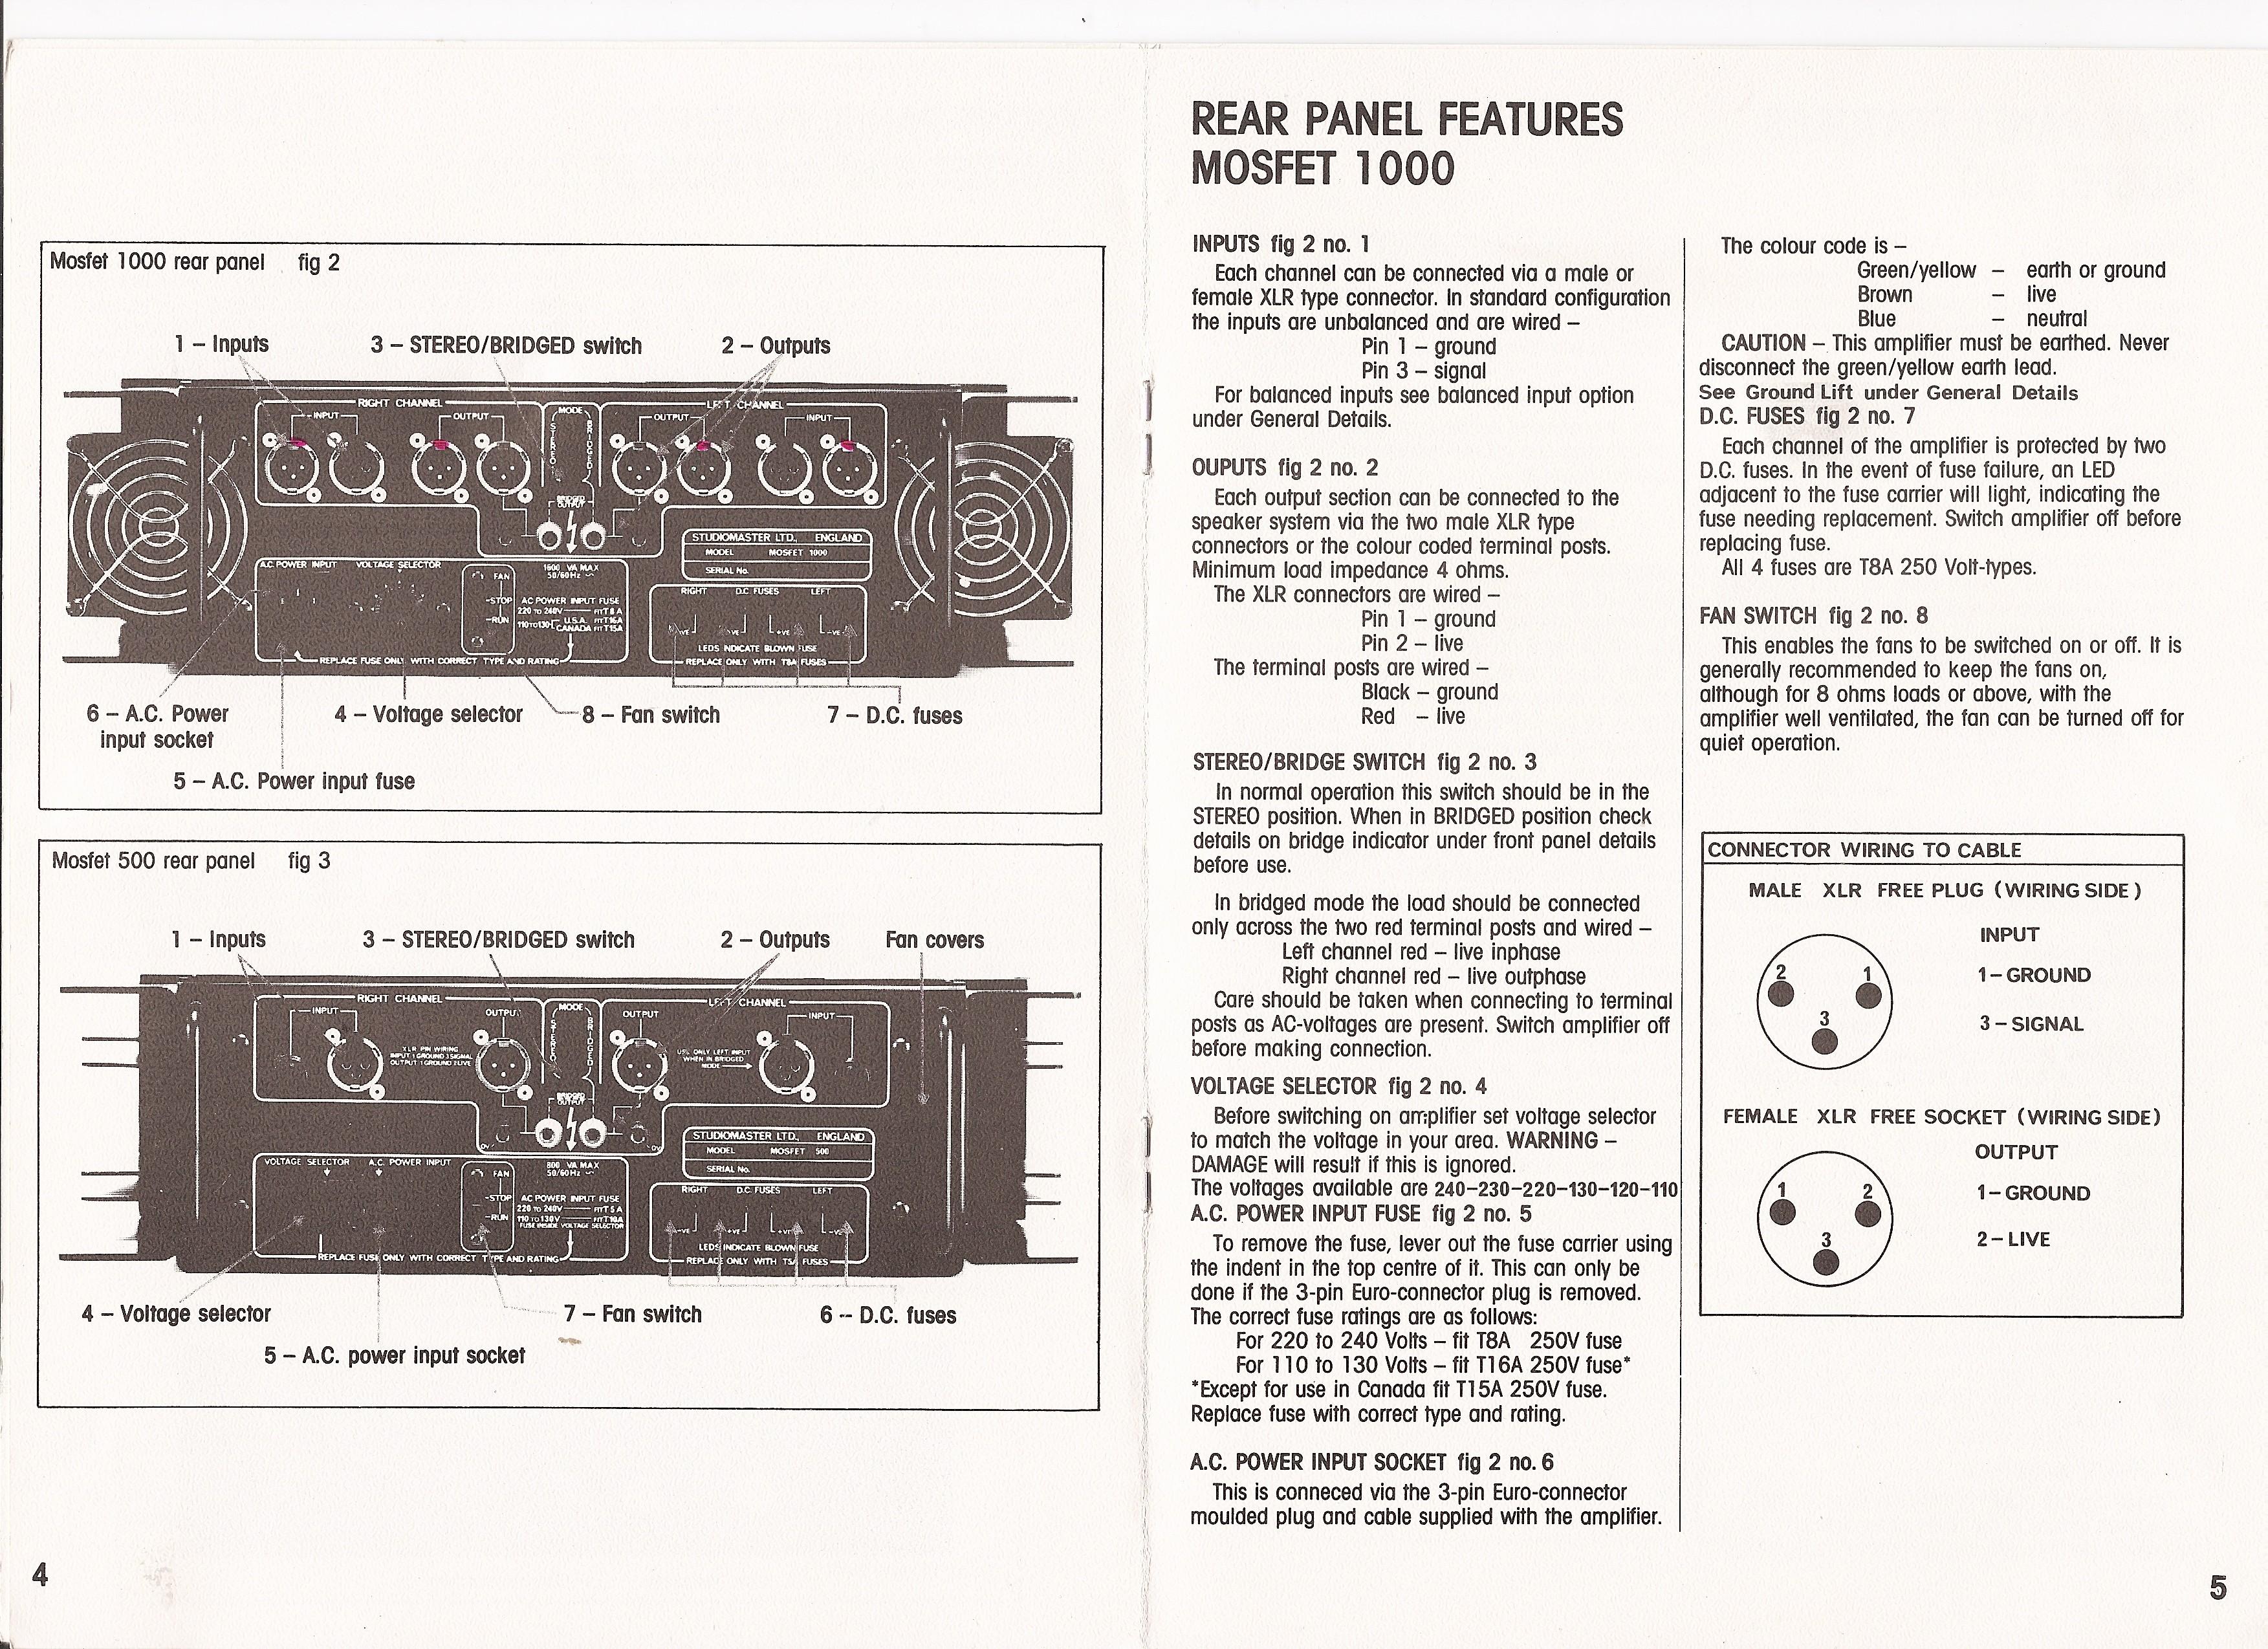 Studiomaster power amplifier - Gearslutz Pro Audio Community